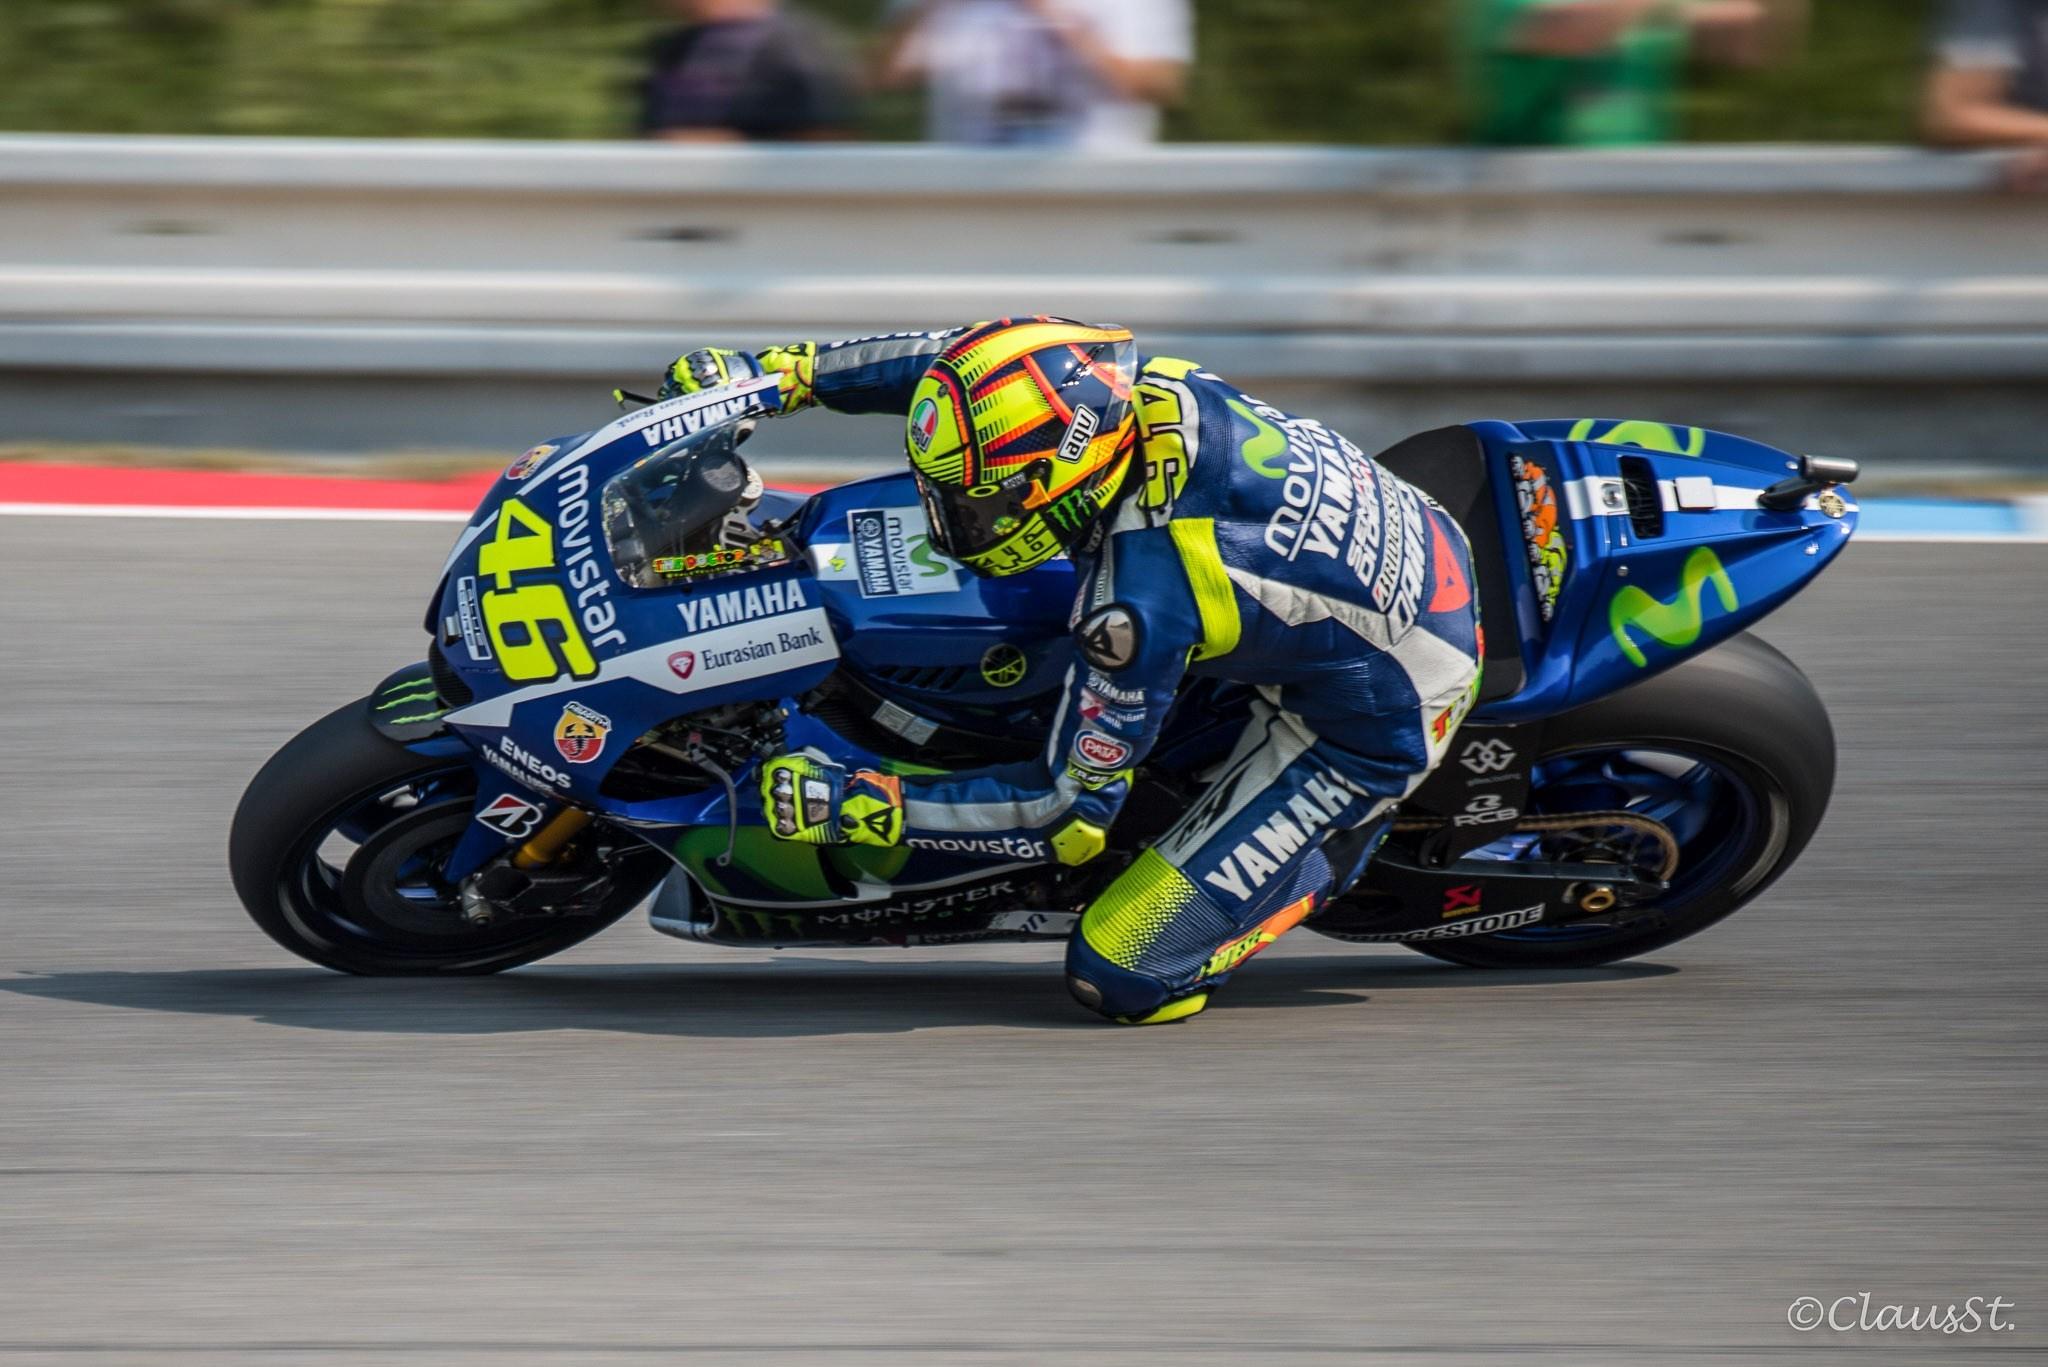 Valentino-Rossi-3-3.jpg